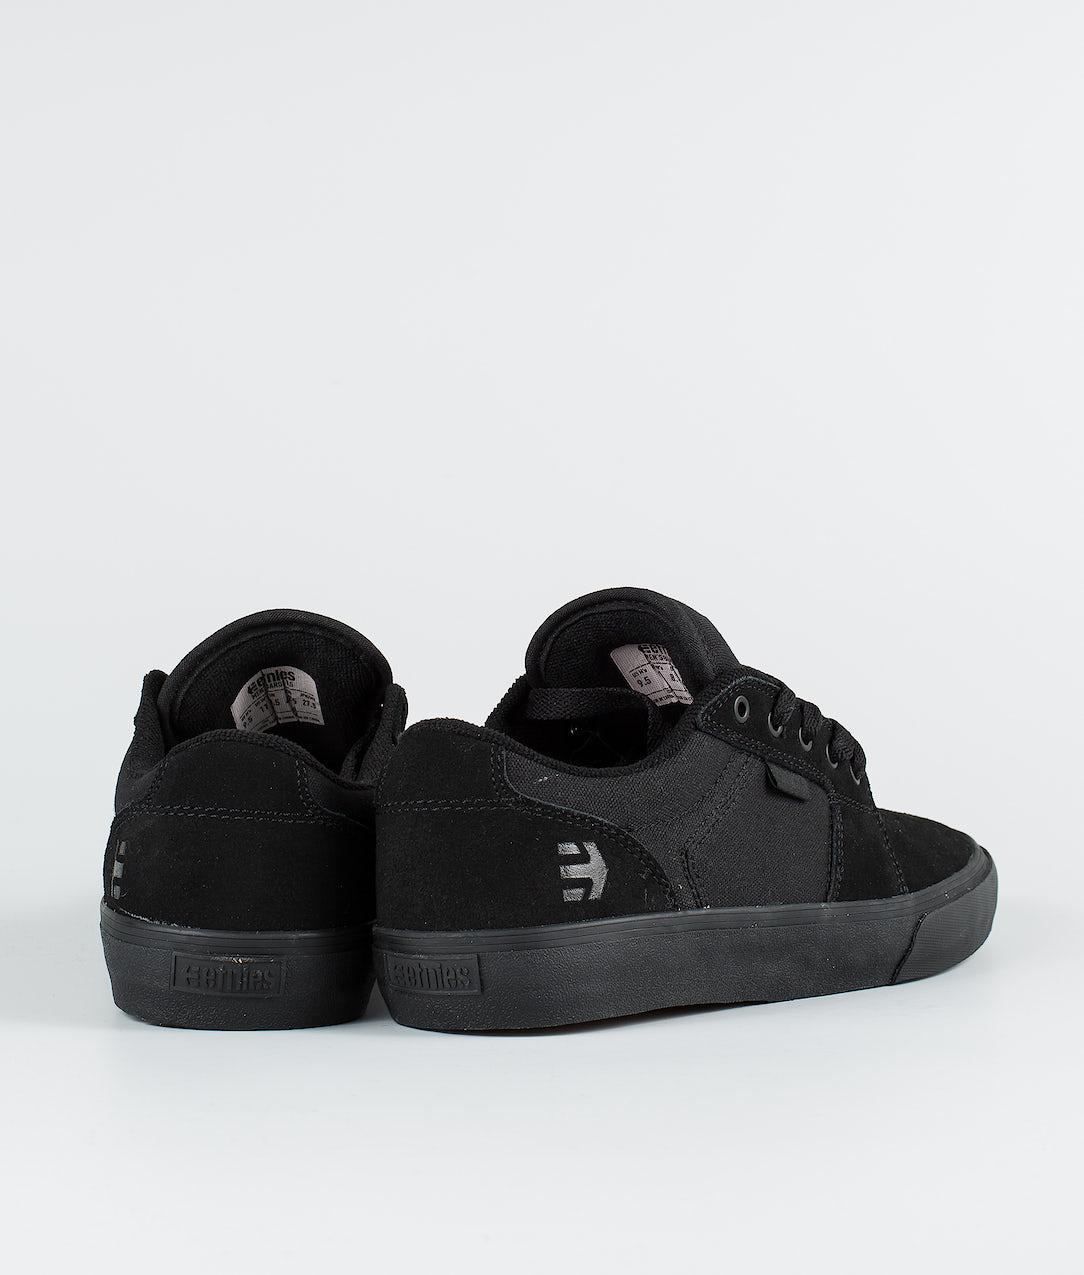 new style 8d091 1ea75 Etnies Barge LS Scarpe Black/Black/Black